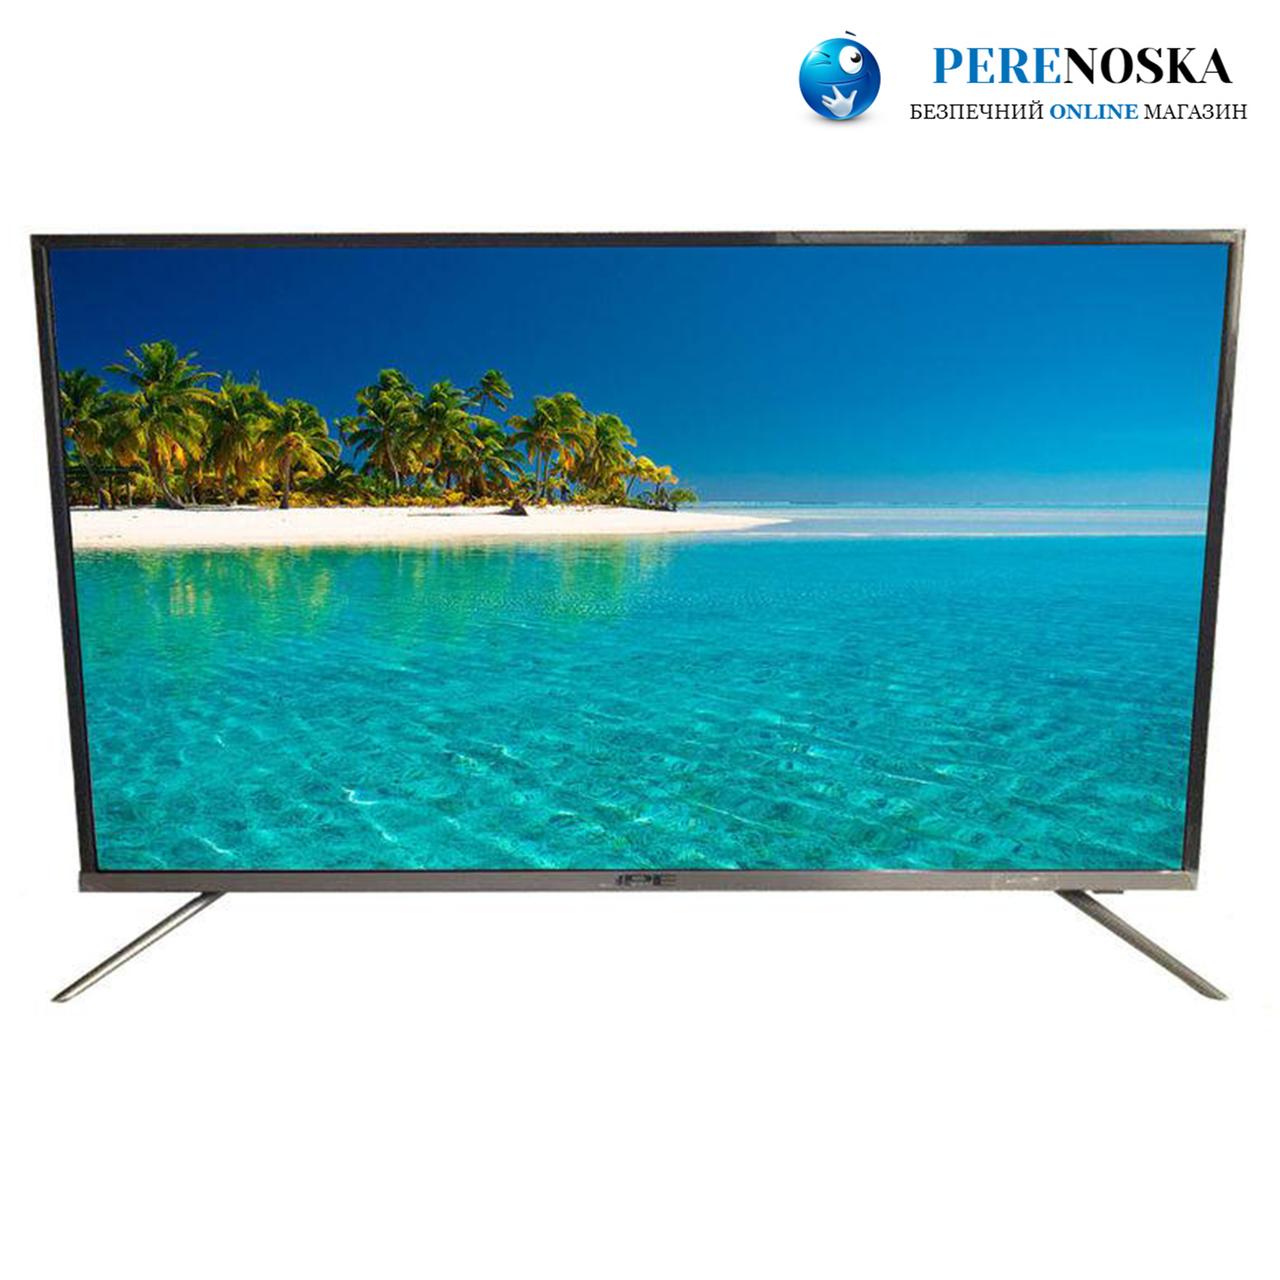 "LCD LED Телевизор JPE 40"" Smart TV, FHD 2K, WiFi, 1Gb Ram, 4Gb Rom, T2, USB/SD, HDMI, VGA, Android 4.4"